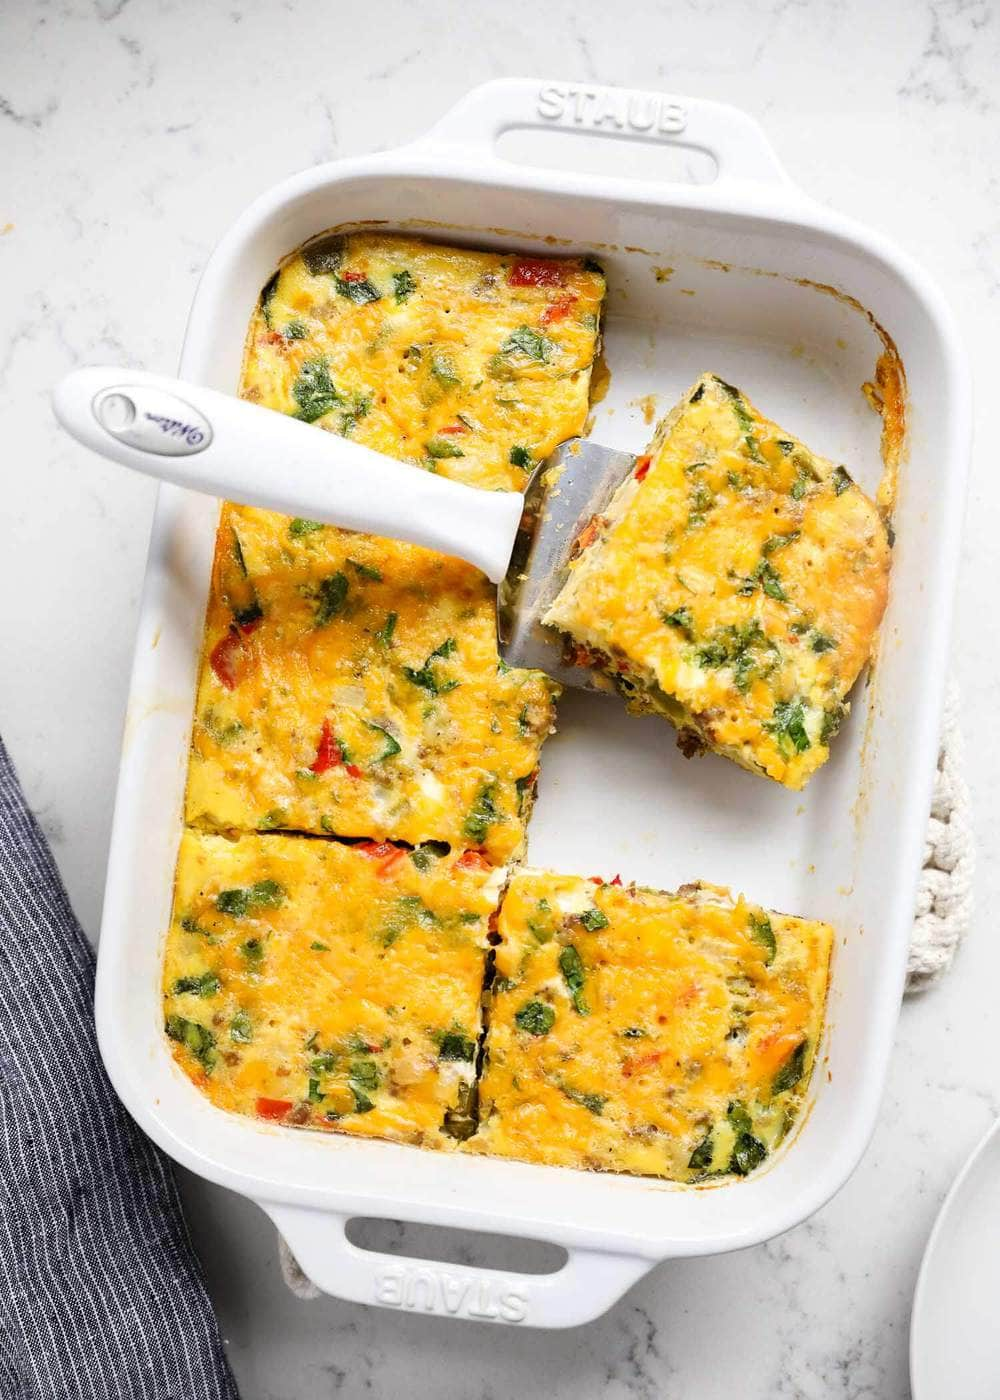 Make Ahead Sausage And Egg Breakfast Casserole I Heart